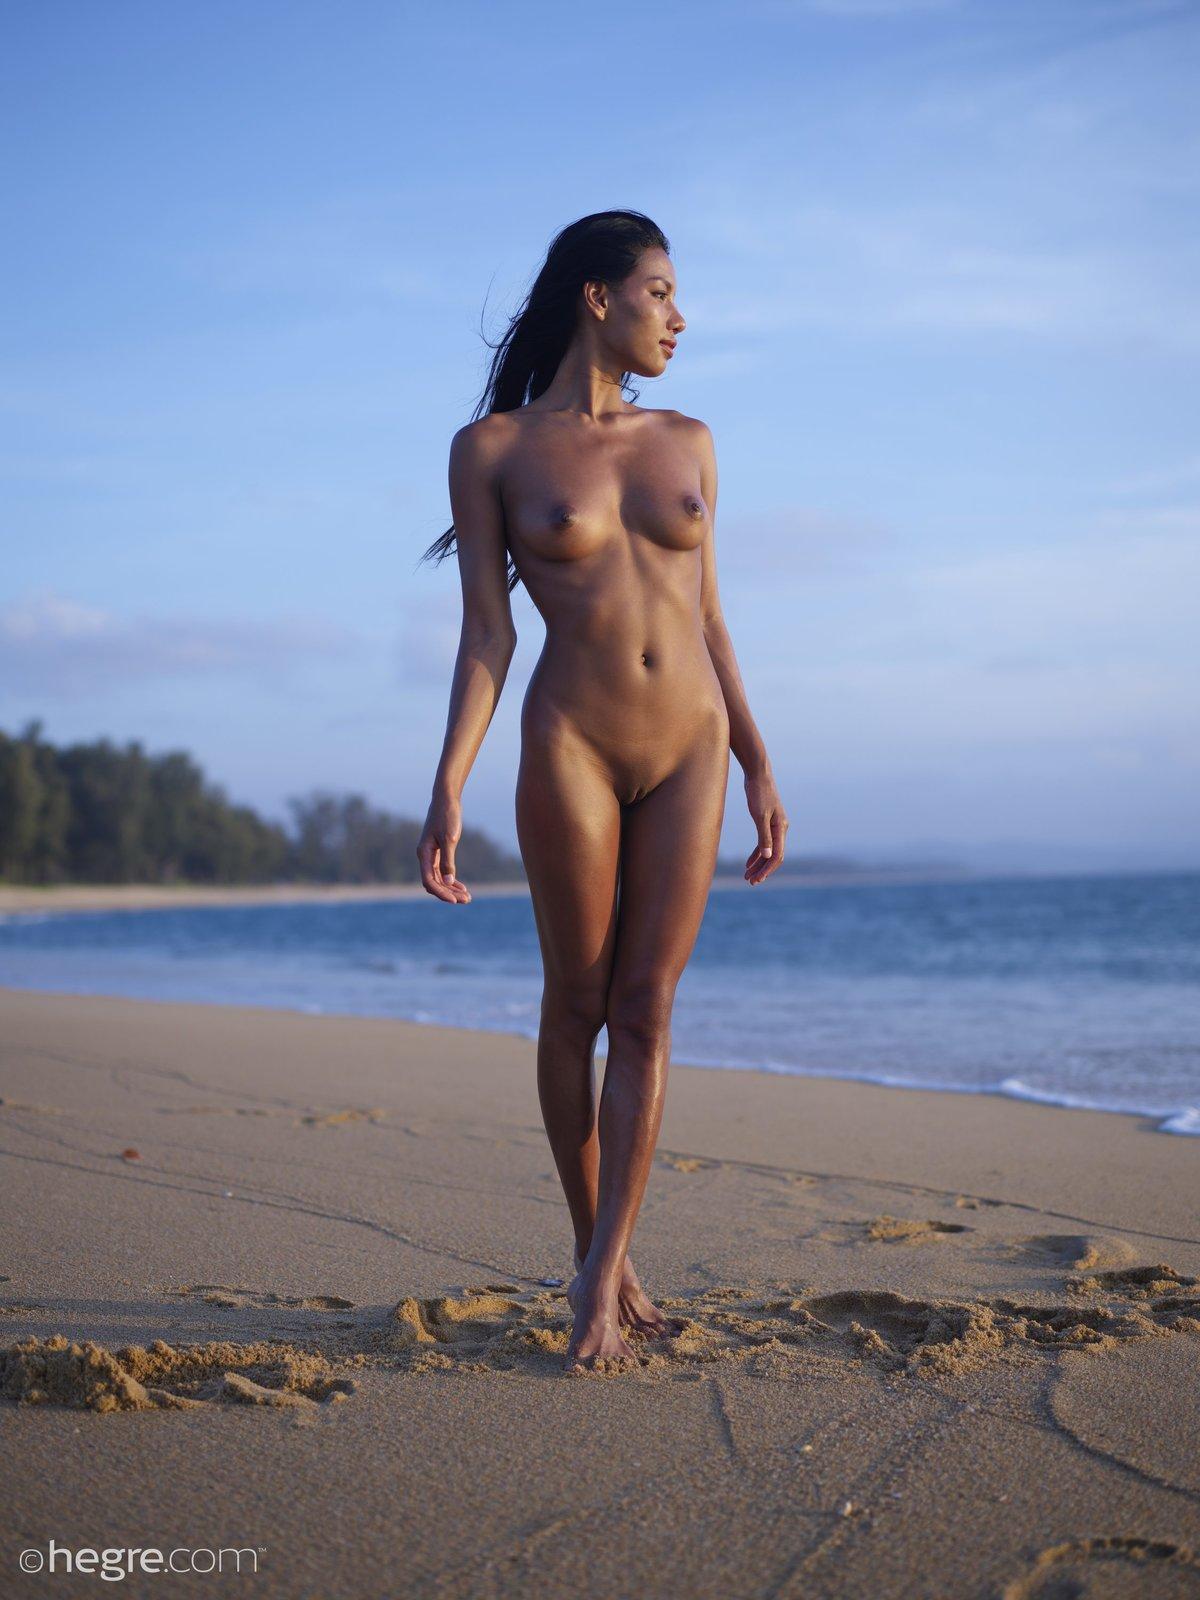 a Laotian girl named Chloe posing nude